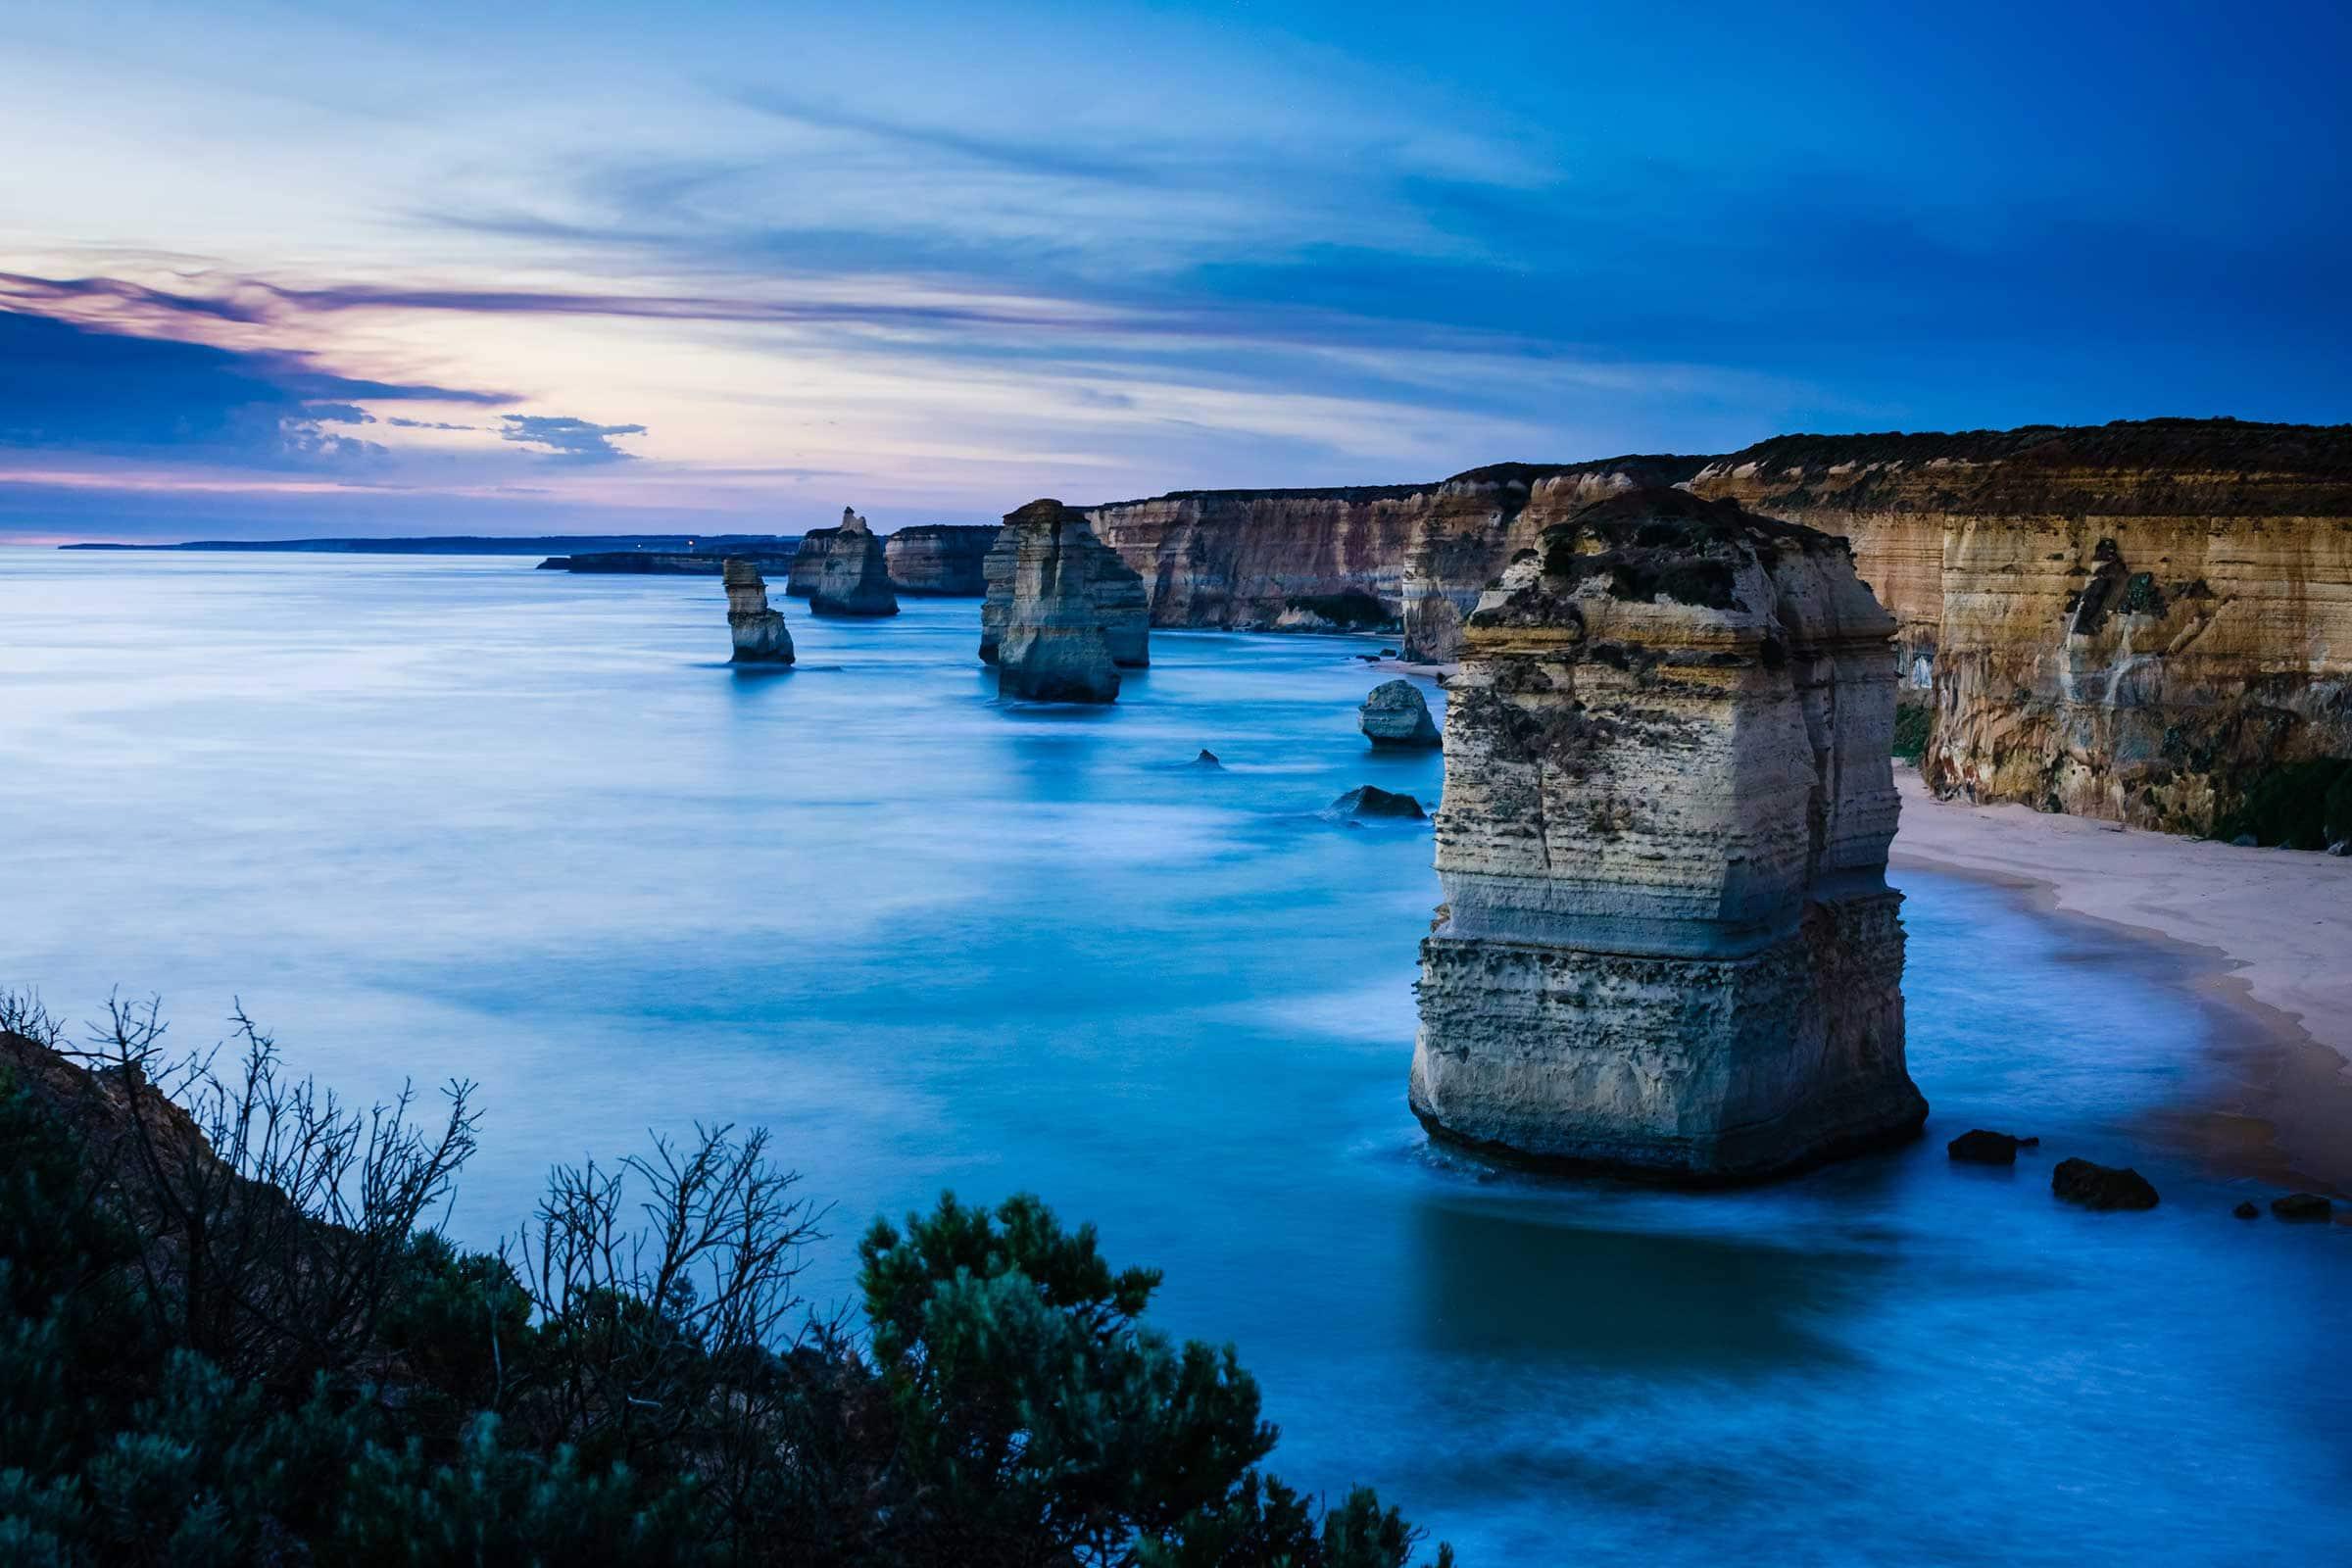 Twelve Apostles rock formation at sunset